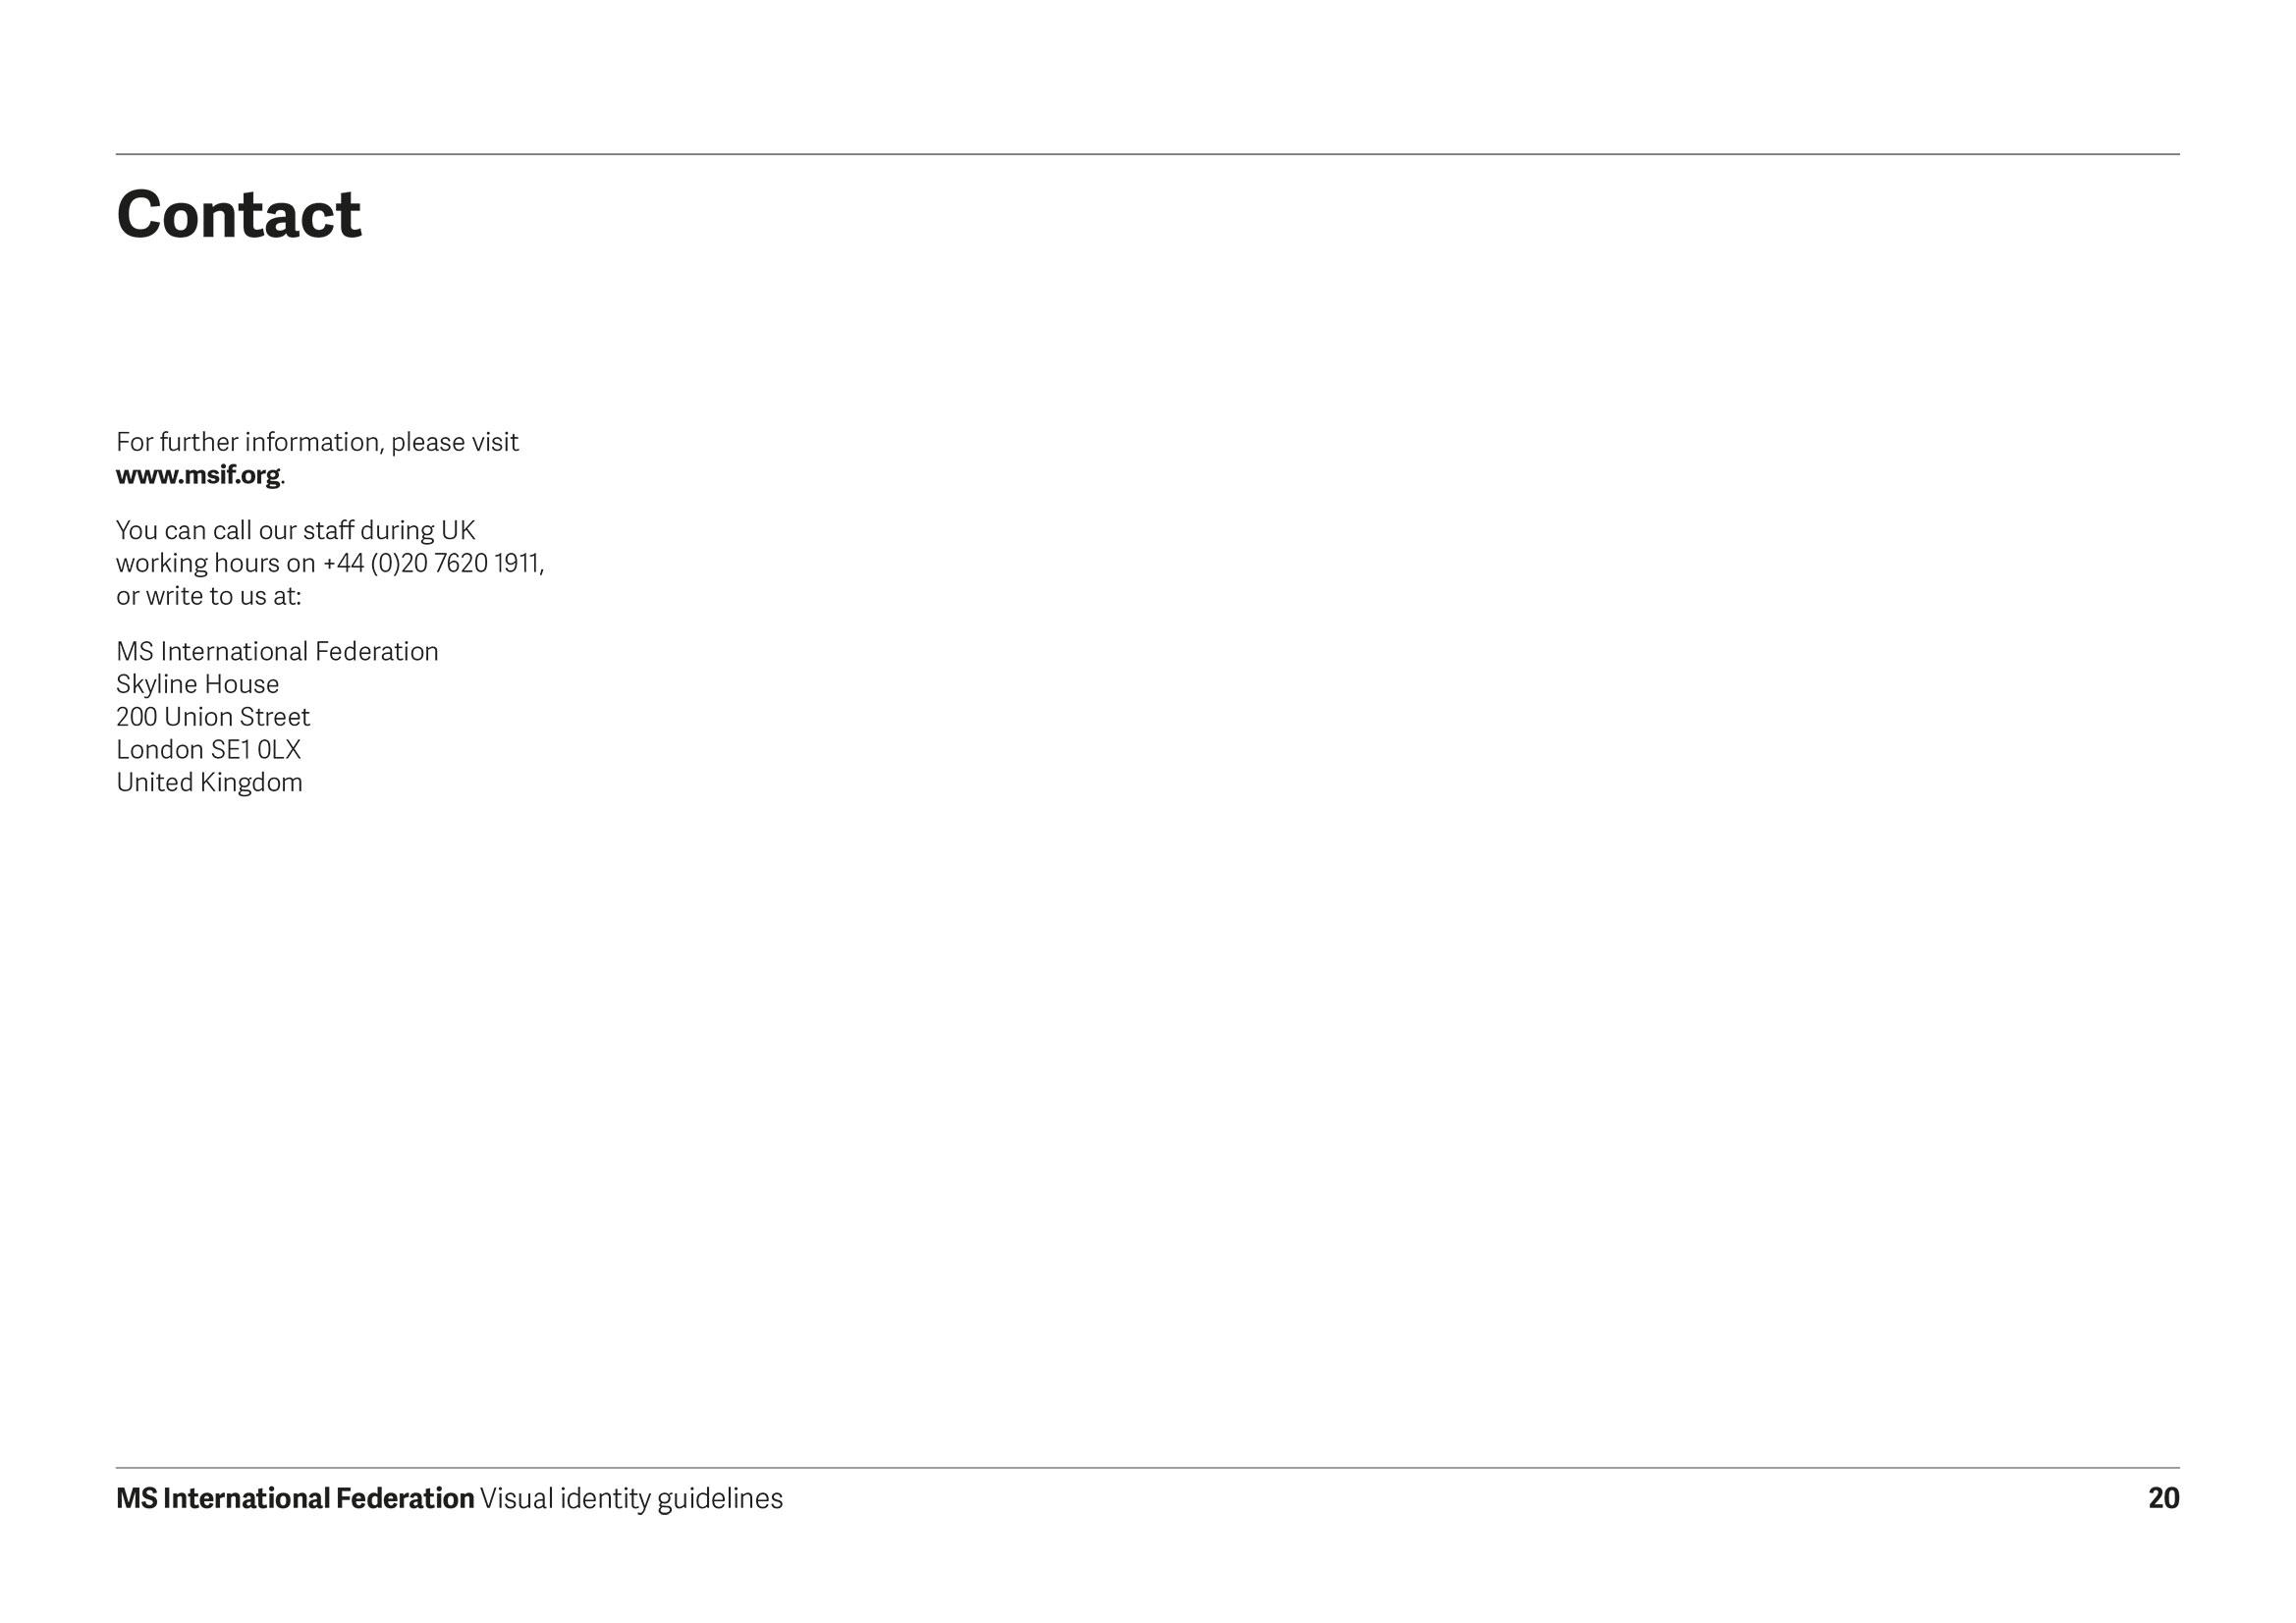 MSIF-VISUAL-IDENTITY-GUIDELINES-20.jpg